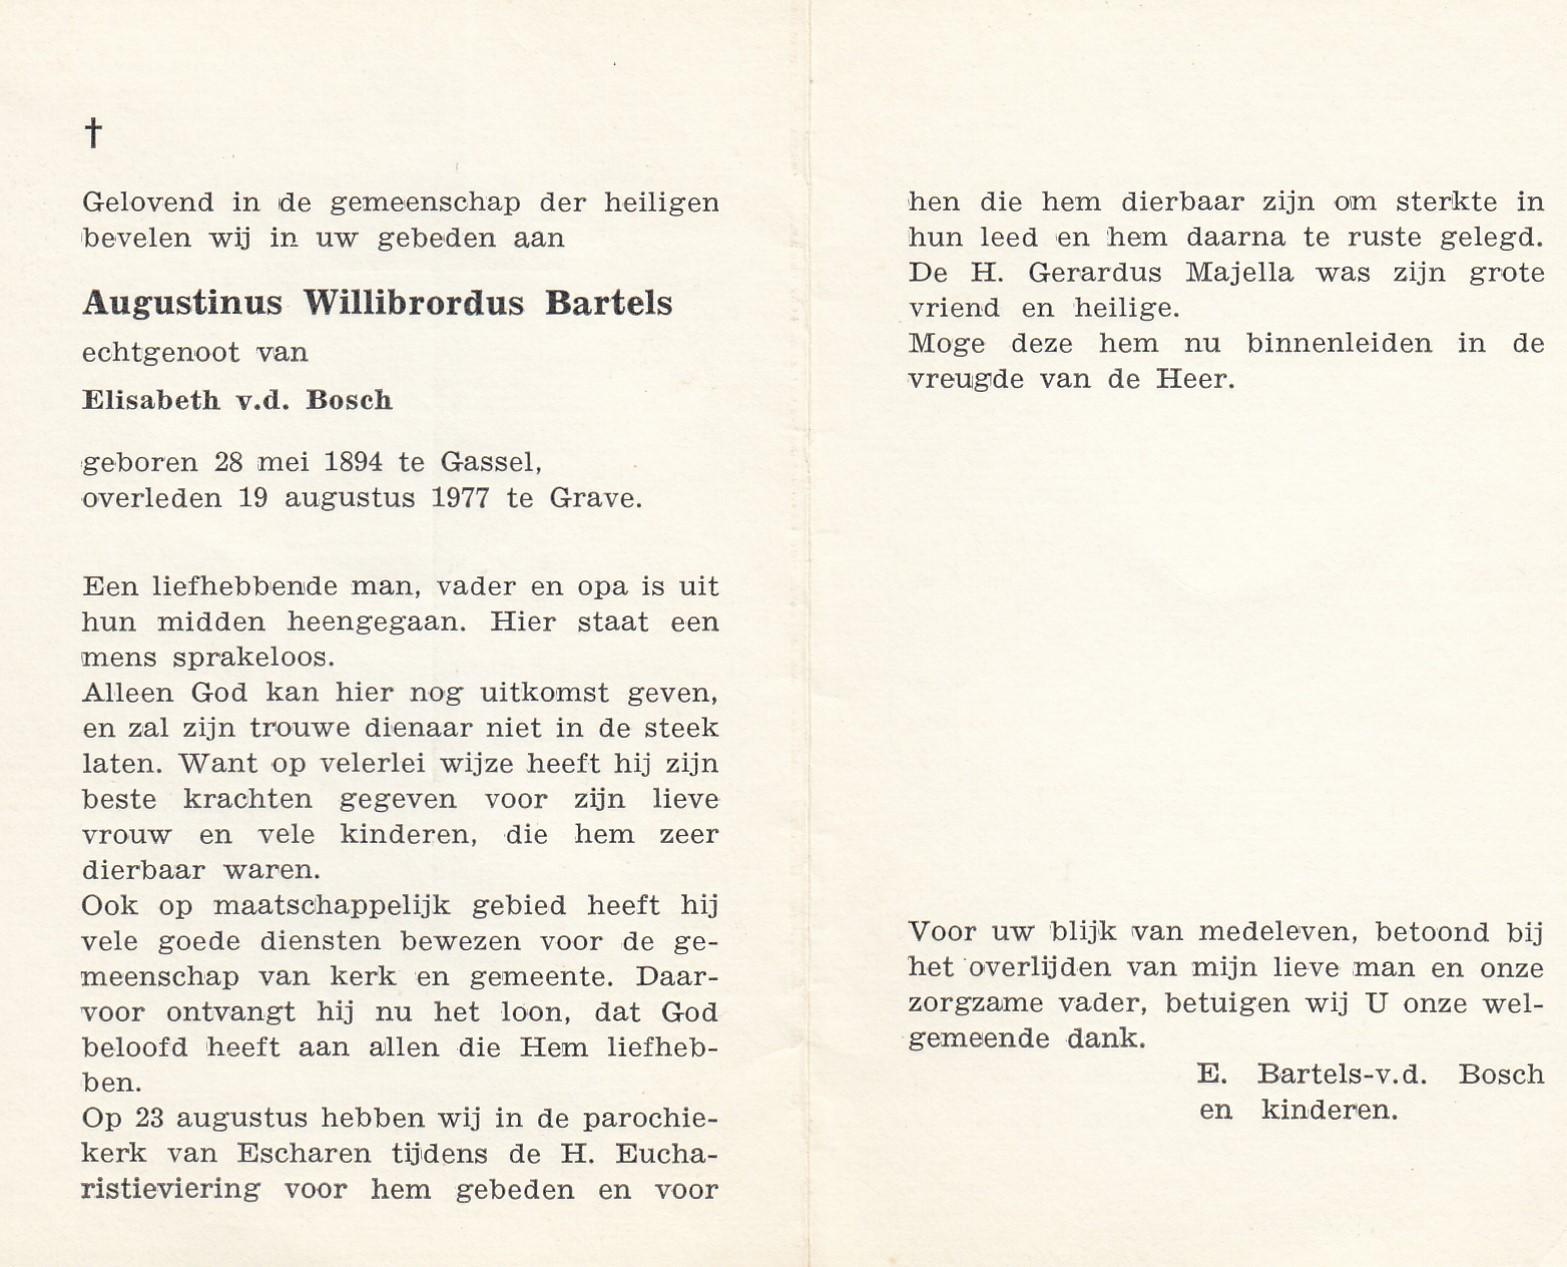 Bidprentje Augustinus Willibrordus Bartels